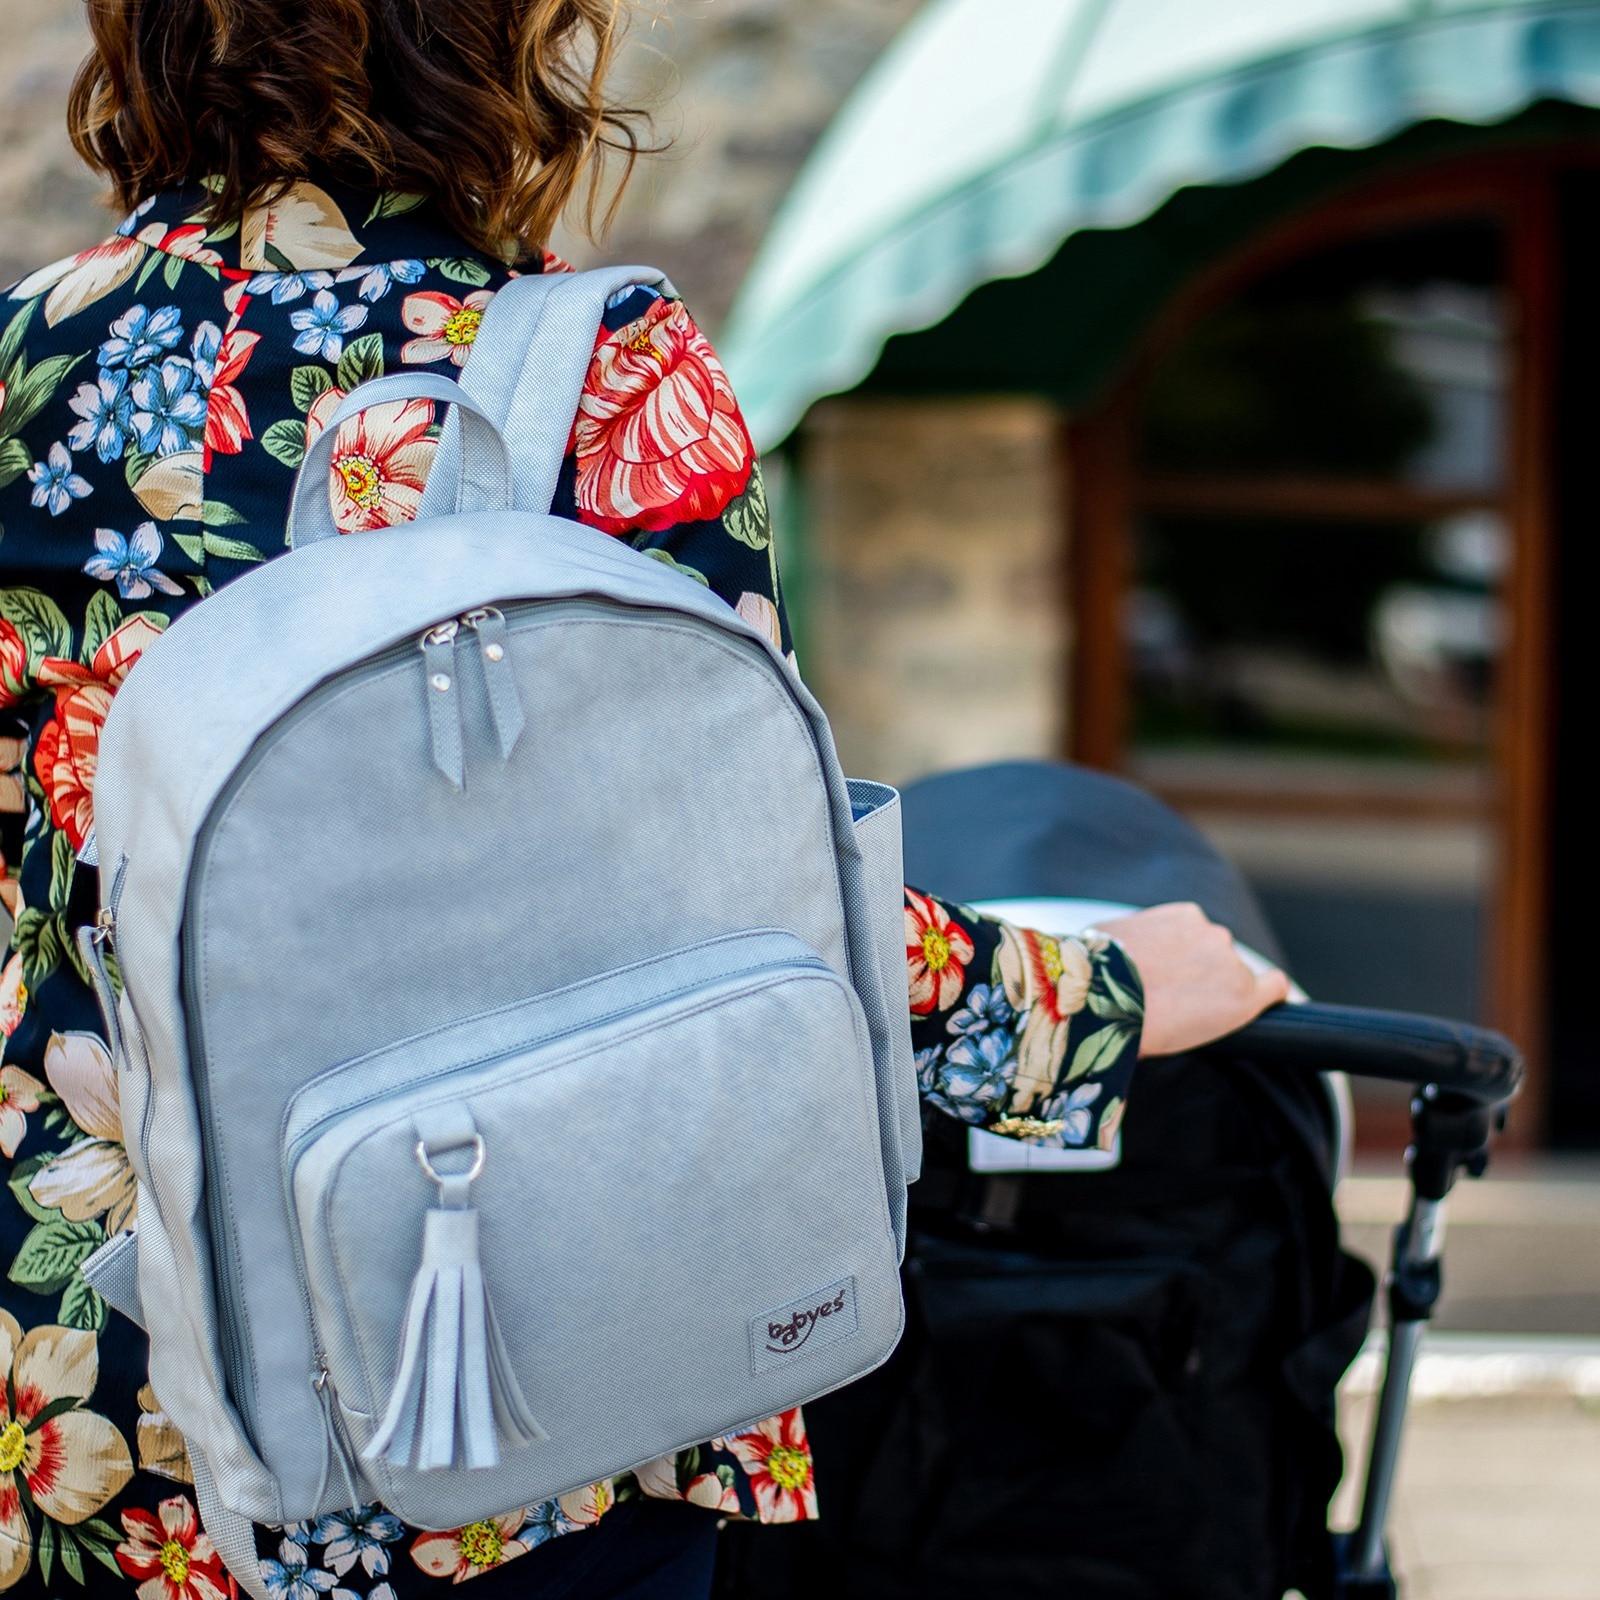 Ebebek Babyes Espace Backpack